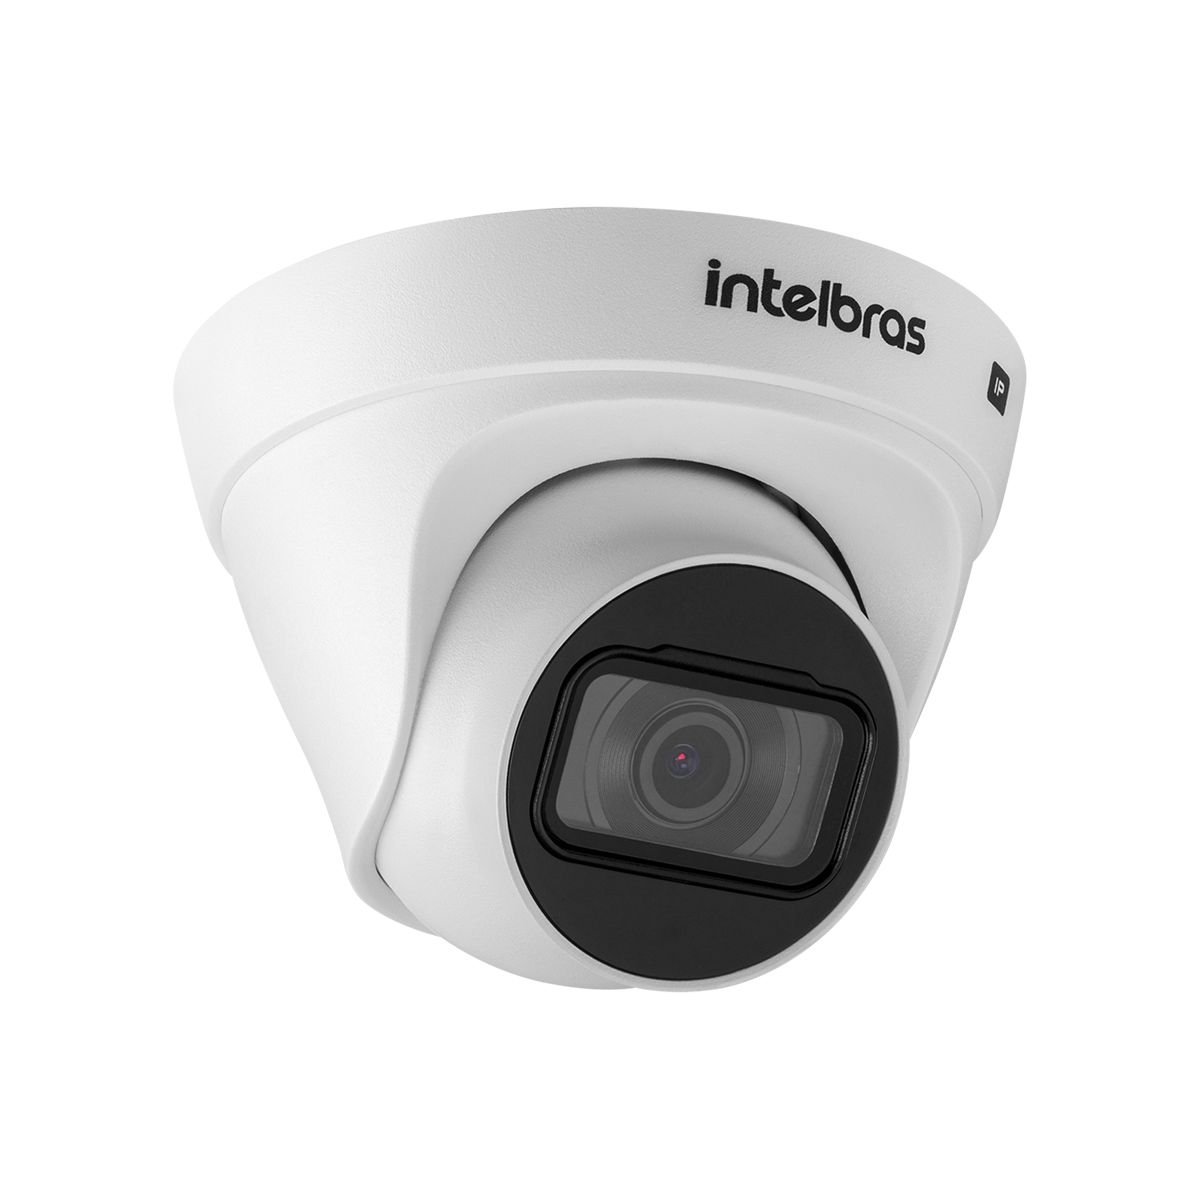 Câmera Dome FullHD 1080p StarLigth VIP 3230 D SL Intelbras